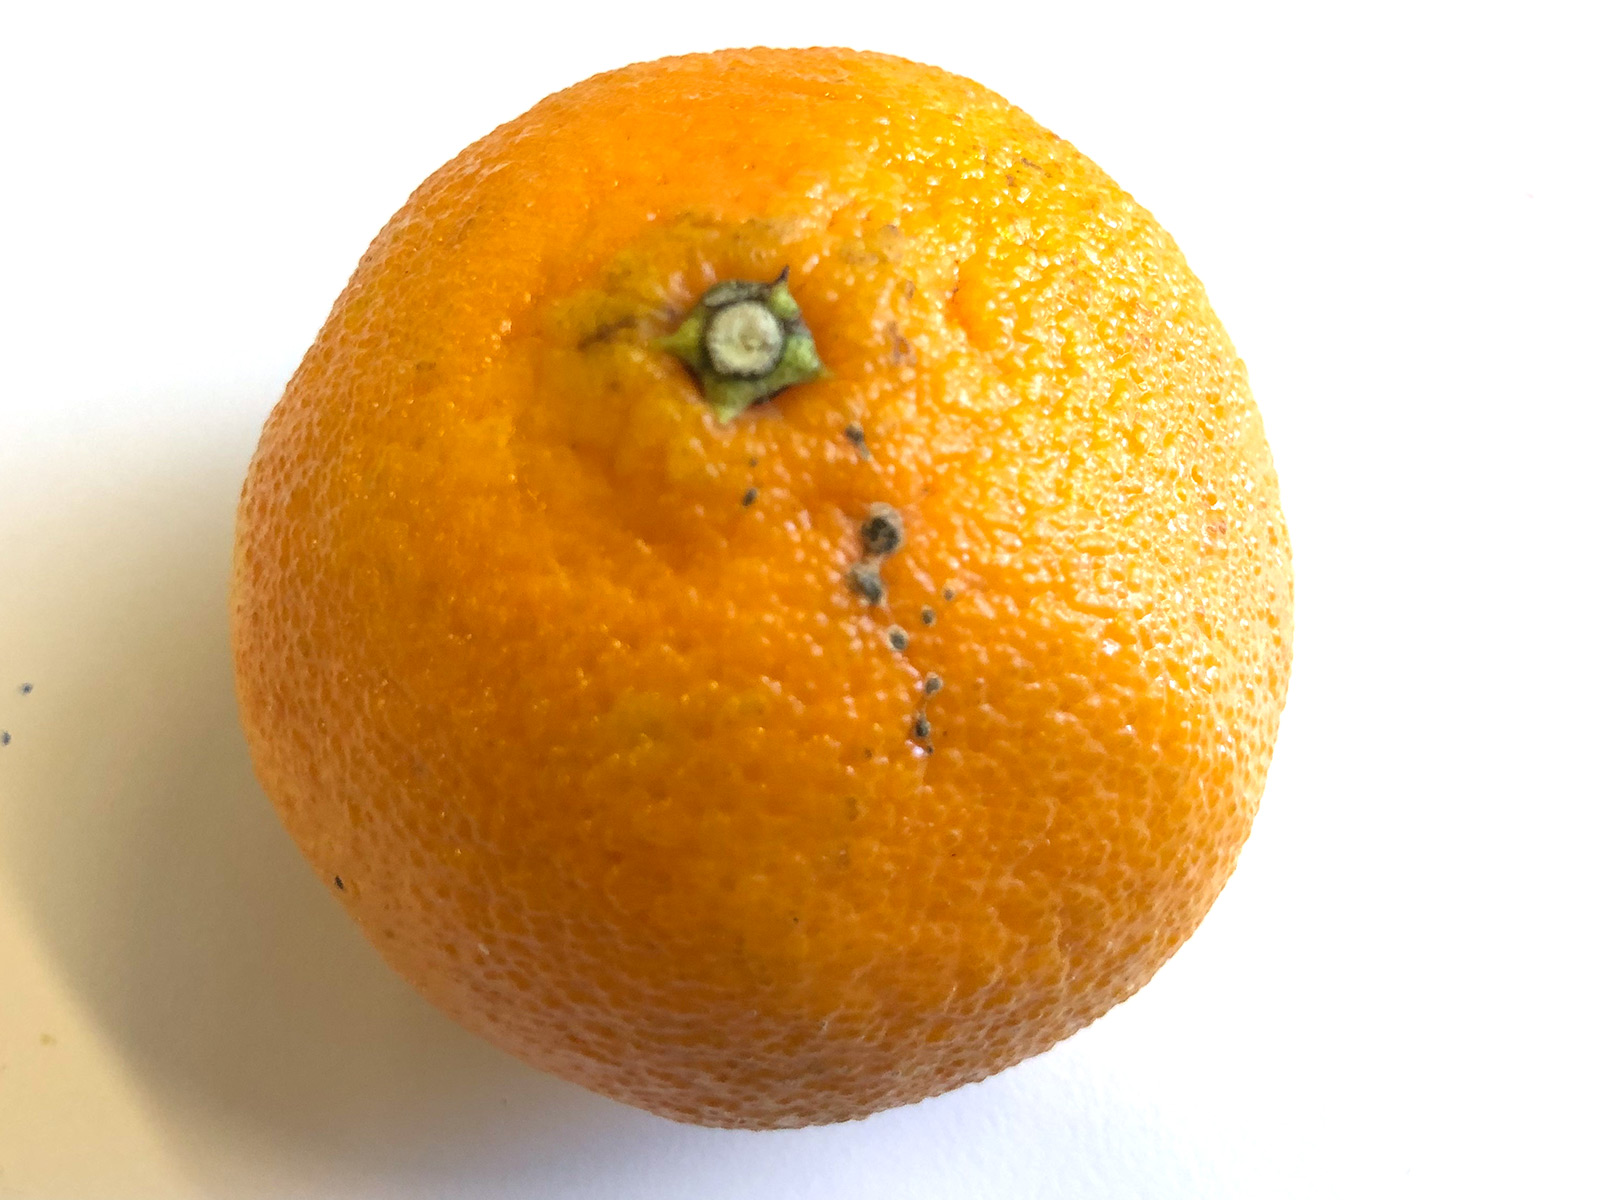 seald-sweet-clementine.jpg